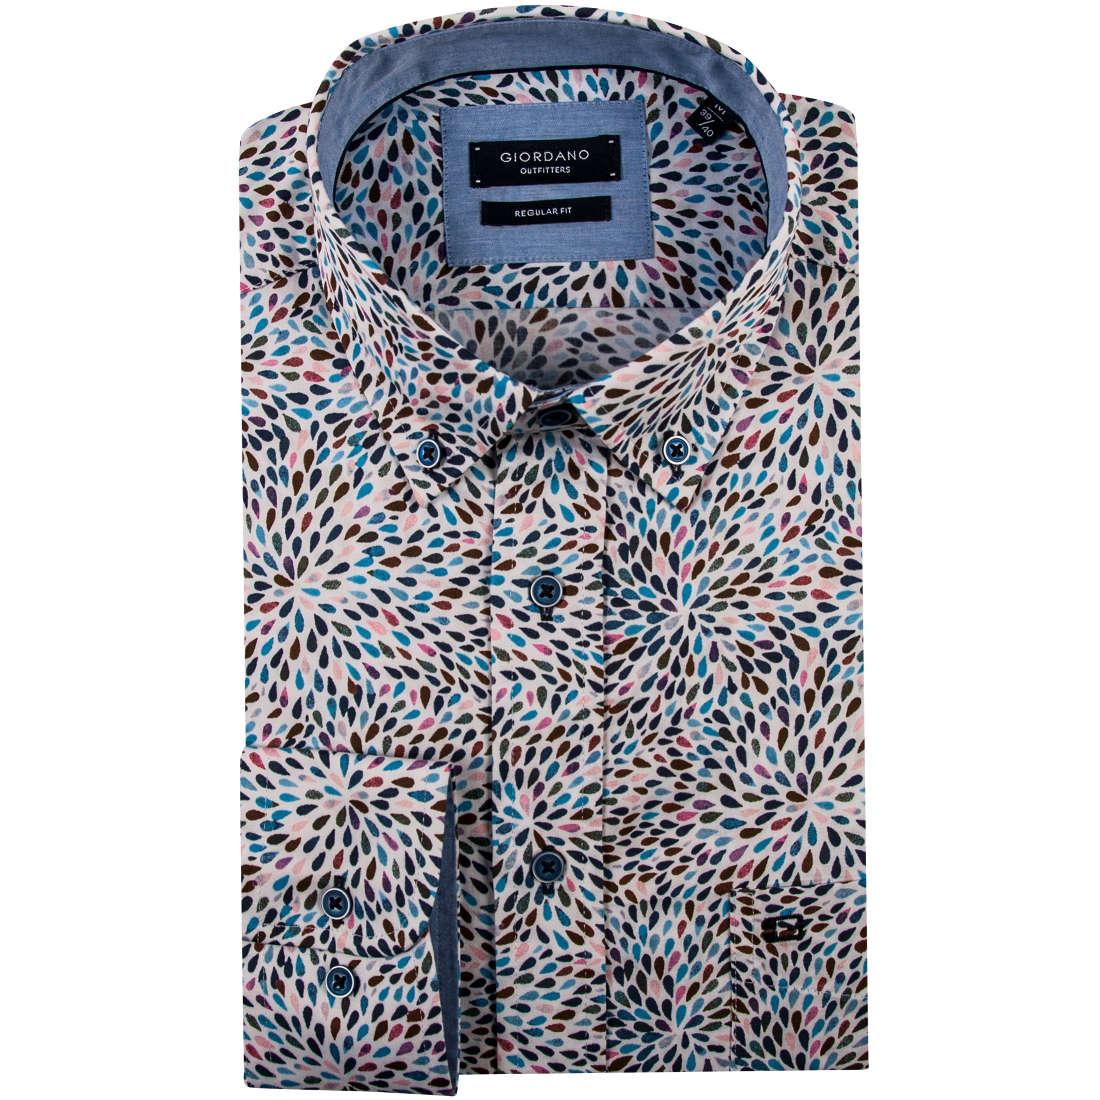 Giordano overhemd Regular Fit 91-7016 in het Aqua